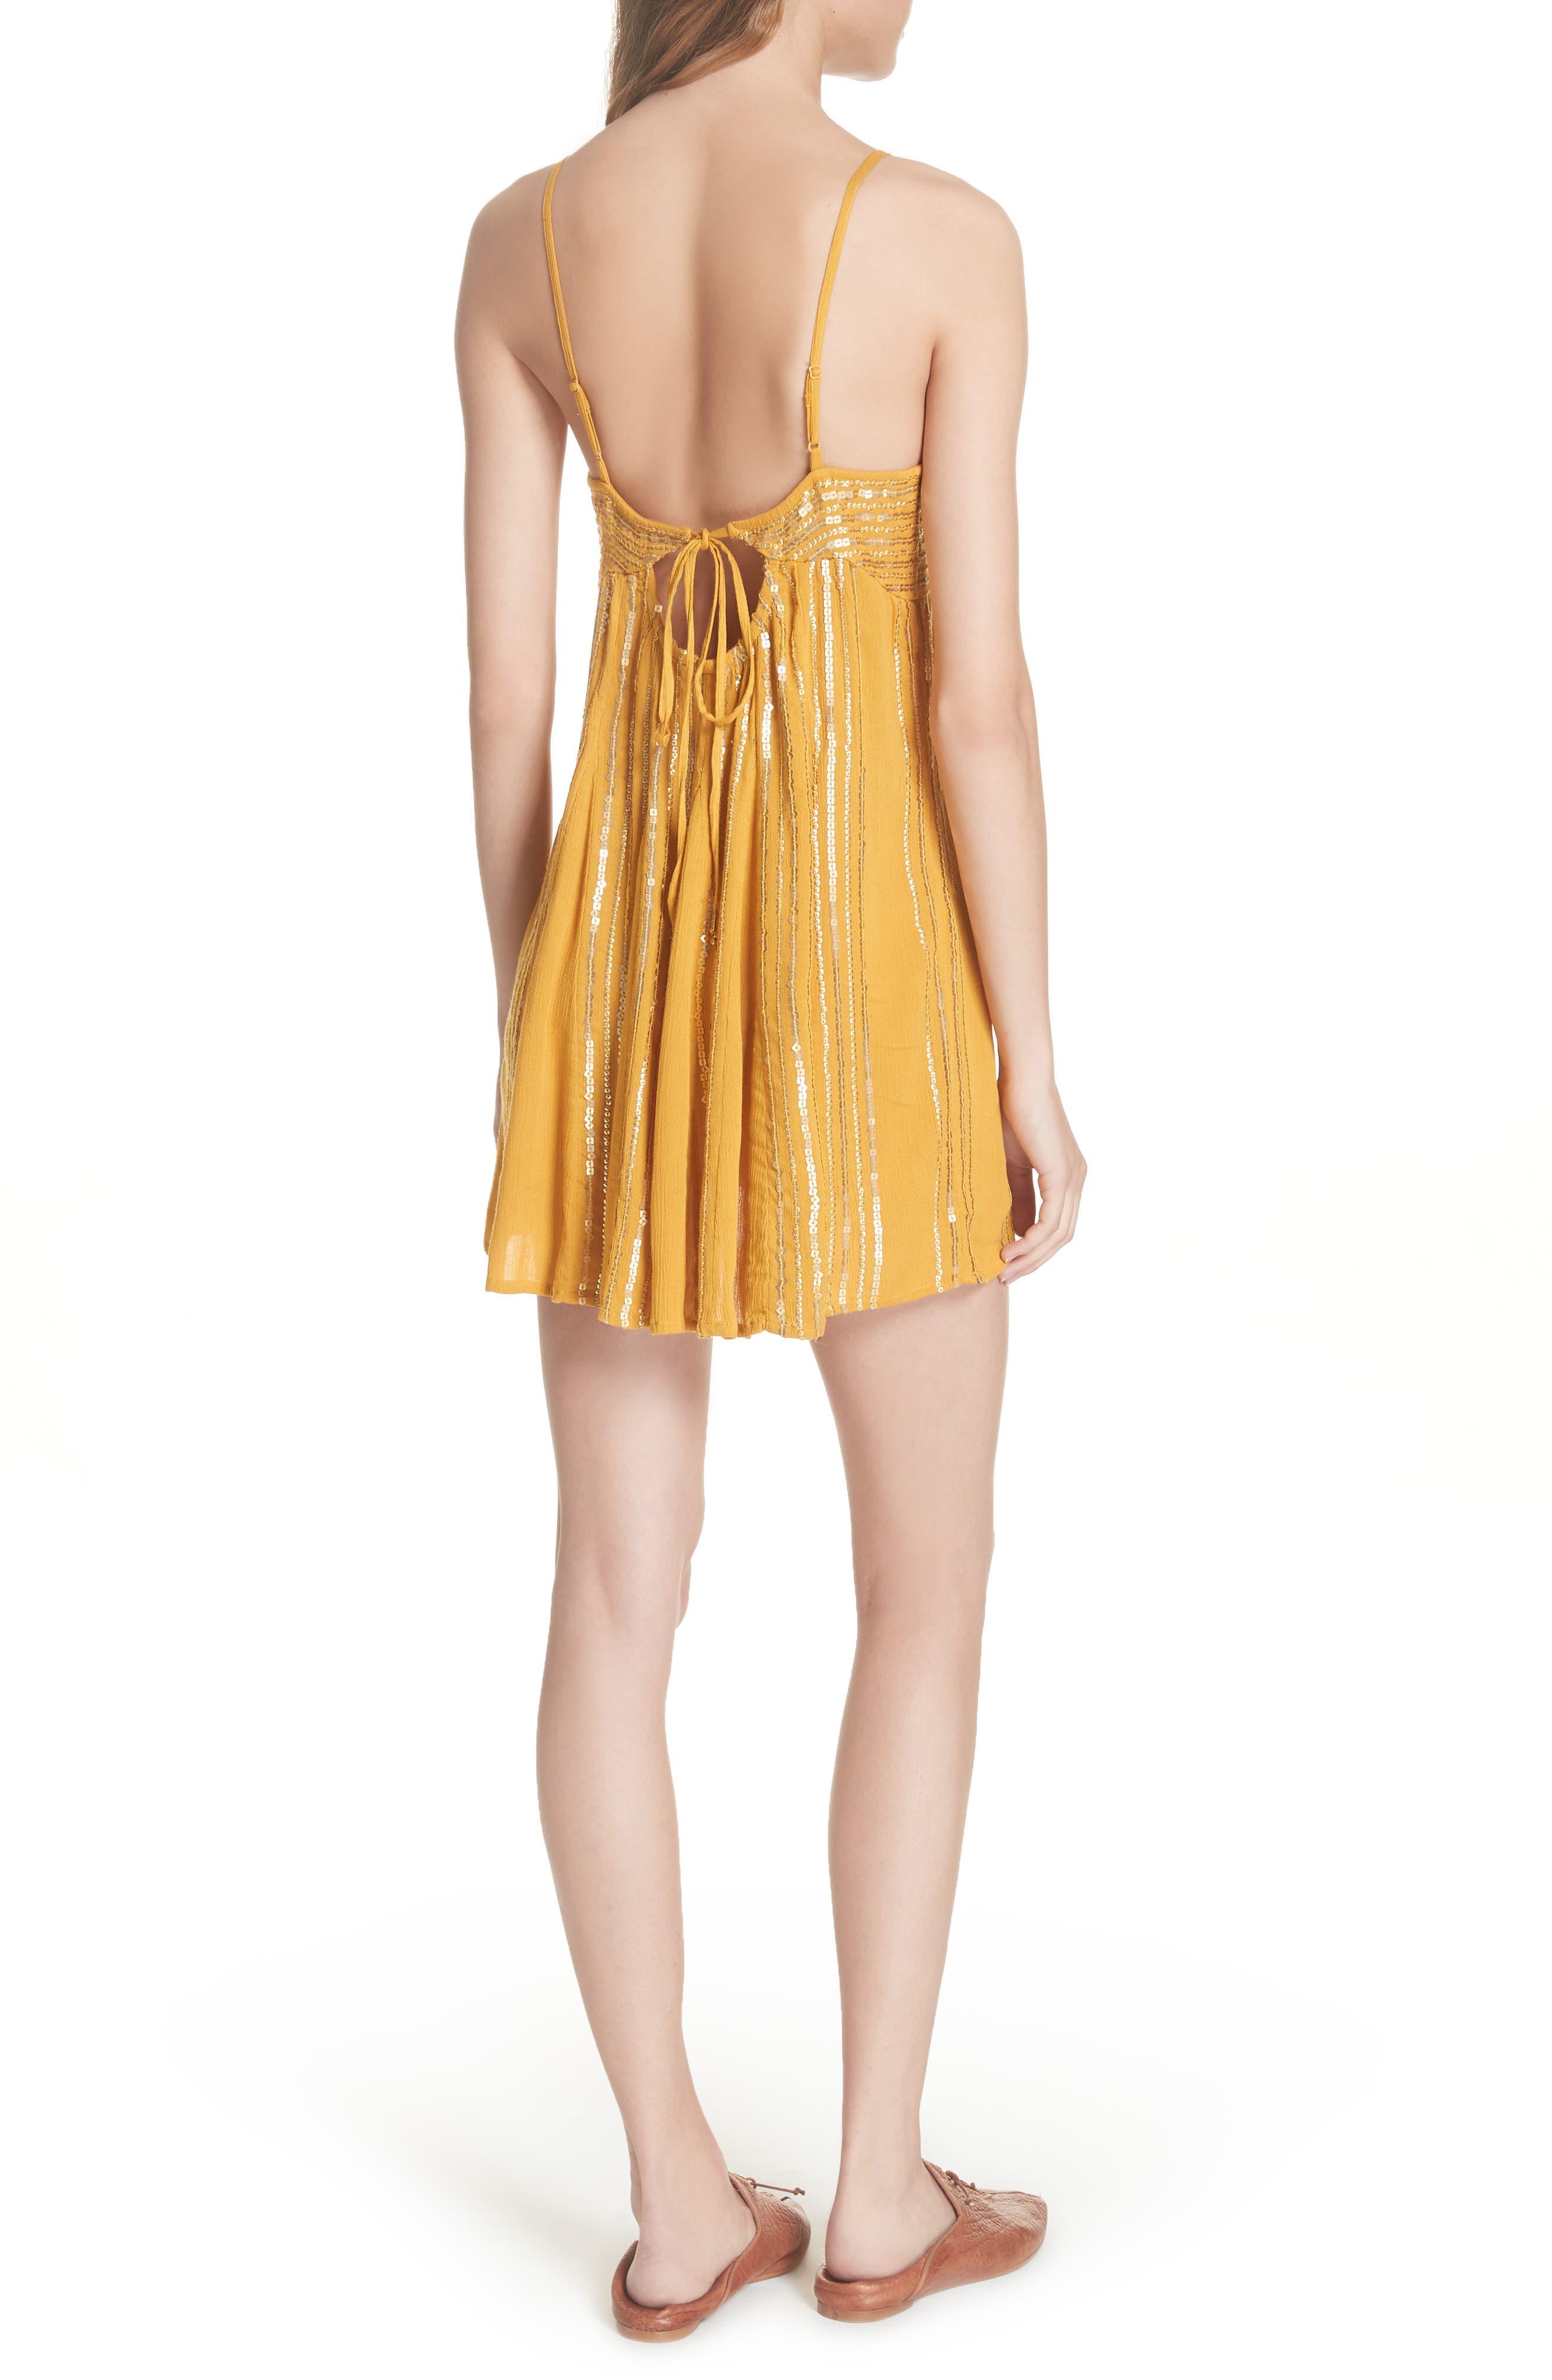 Here She Is Embellished Swing Minidress,                             Alternate thumbnail 2, color,                             710